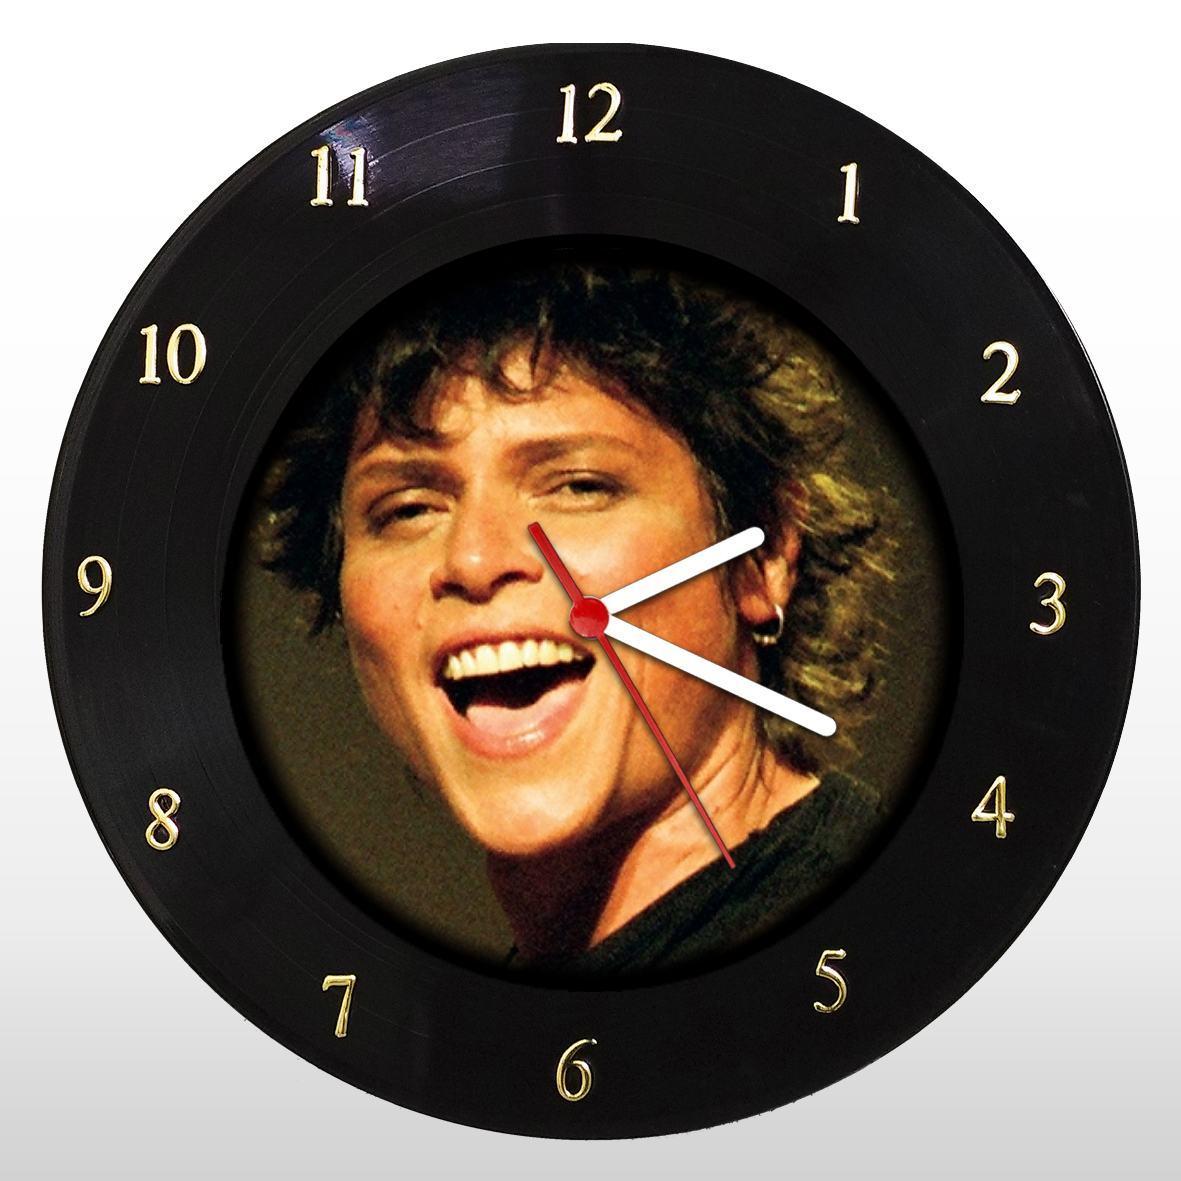 Cássia Eller - Relógio de Parede em Disco de Vinil - Mr. Rock